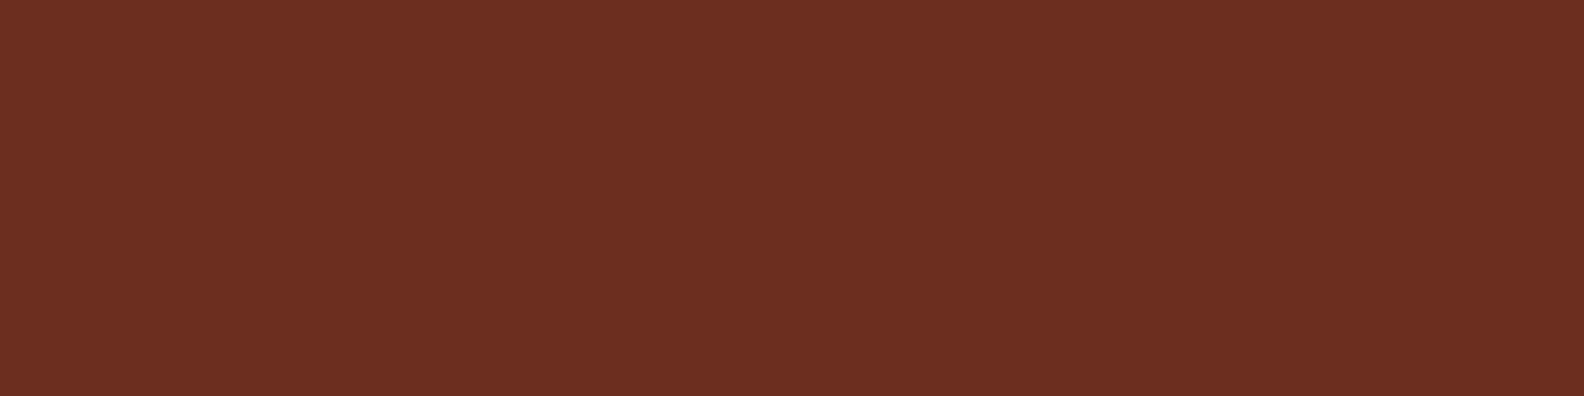 1584x396 Liver Organ Solid Color Background